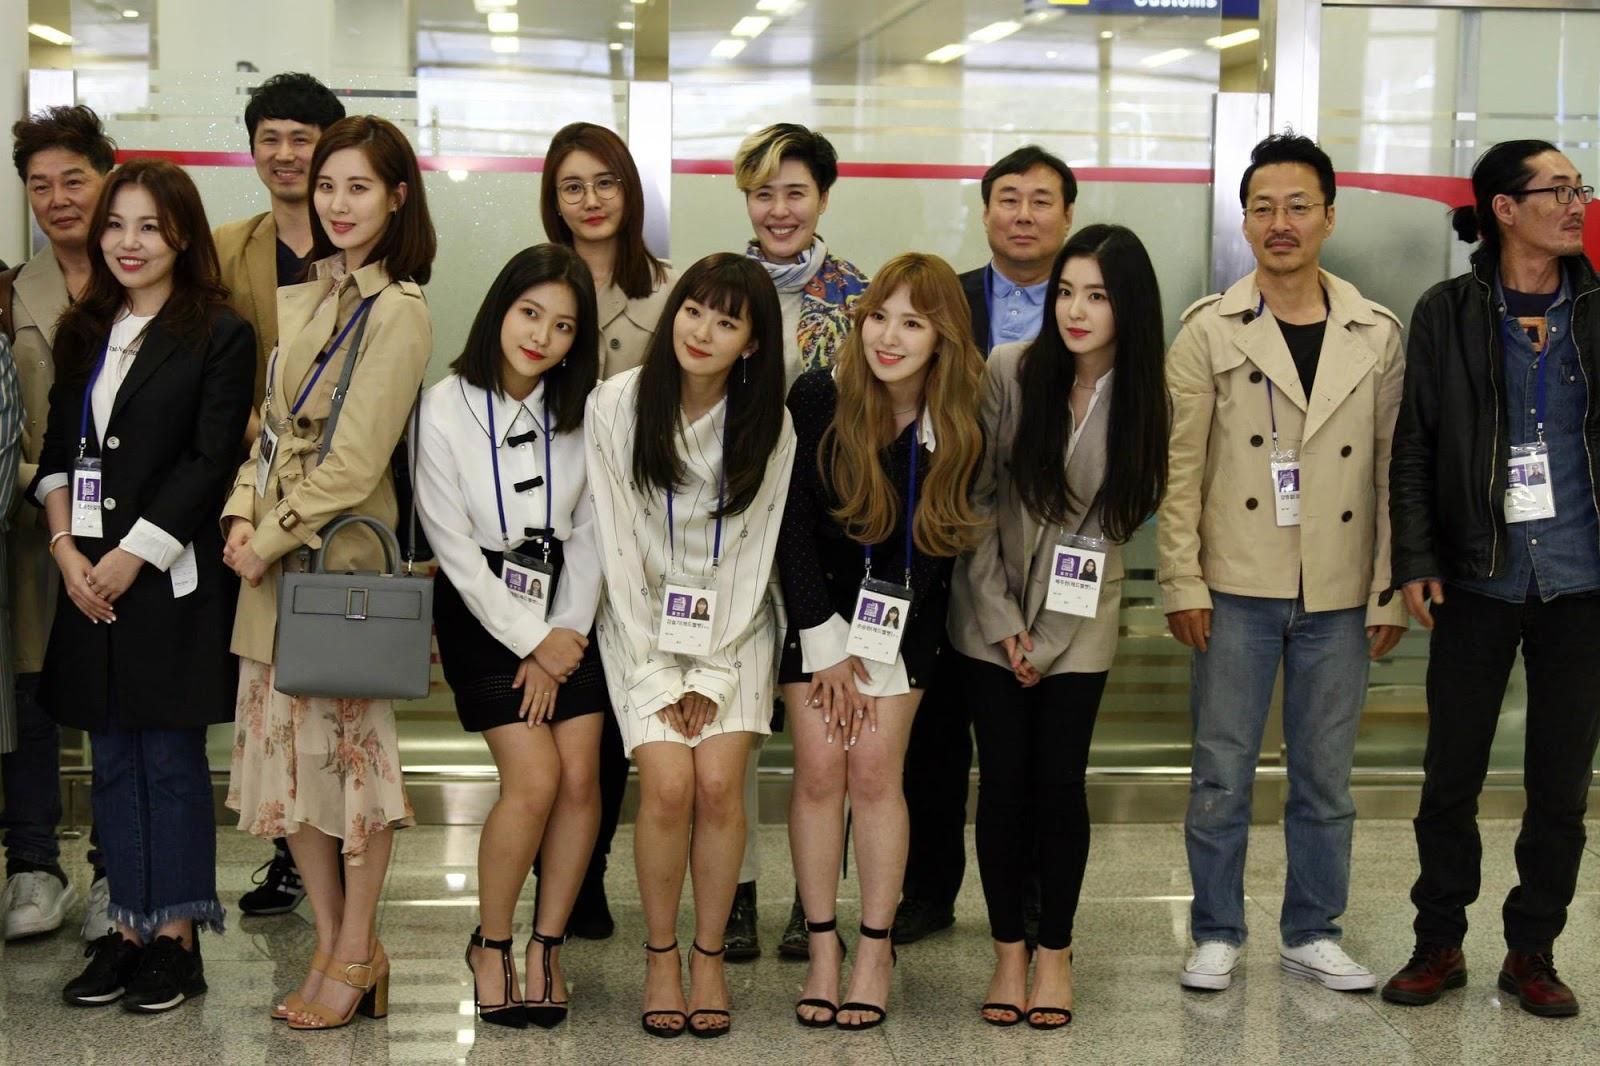 Red Velvet的姜涩琪透露她在朝鲜犯了一个错误后很担心